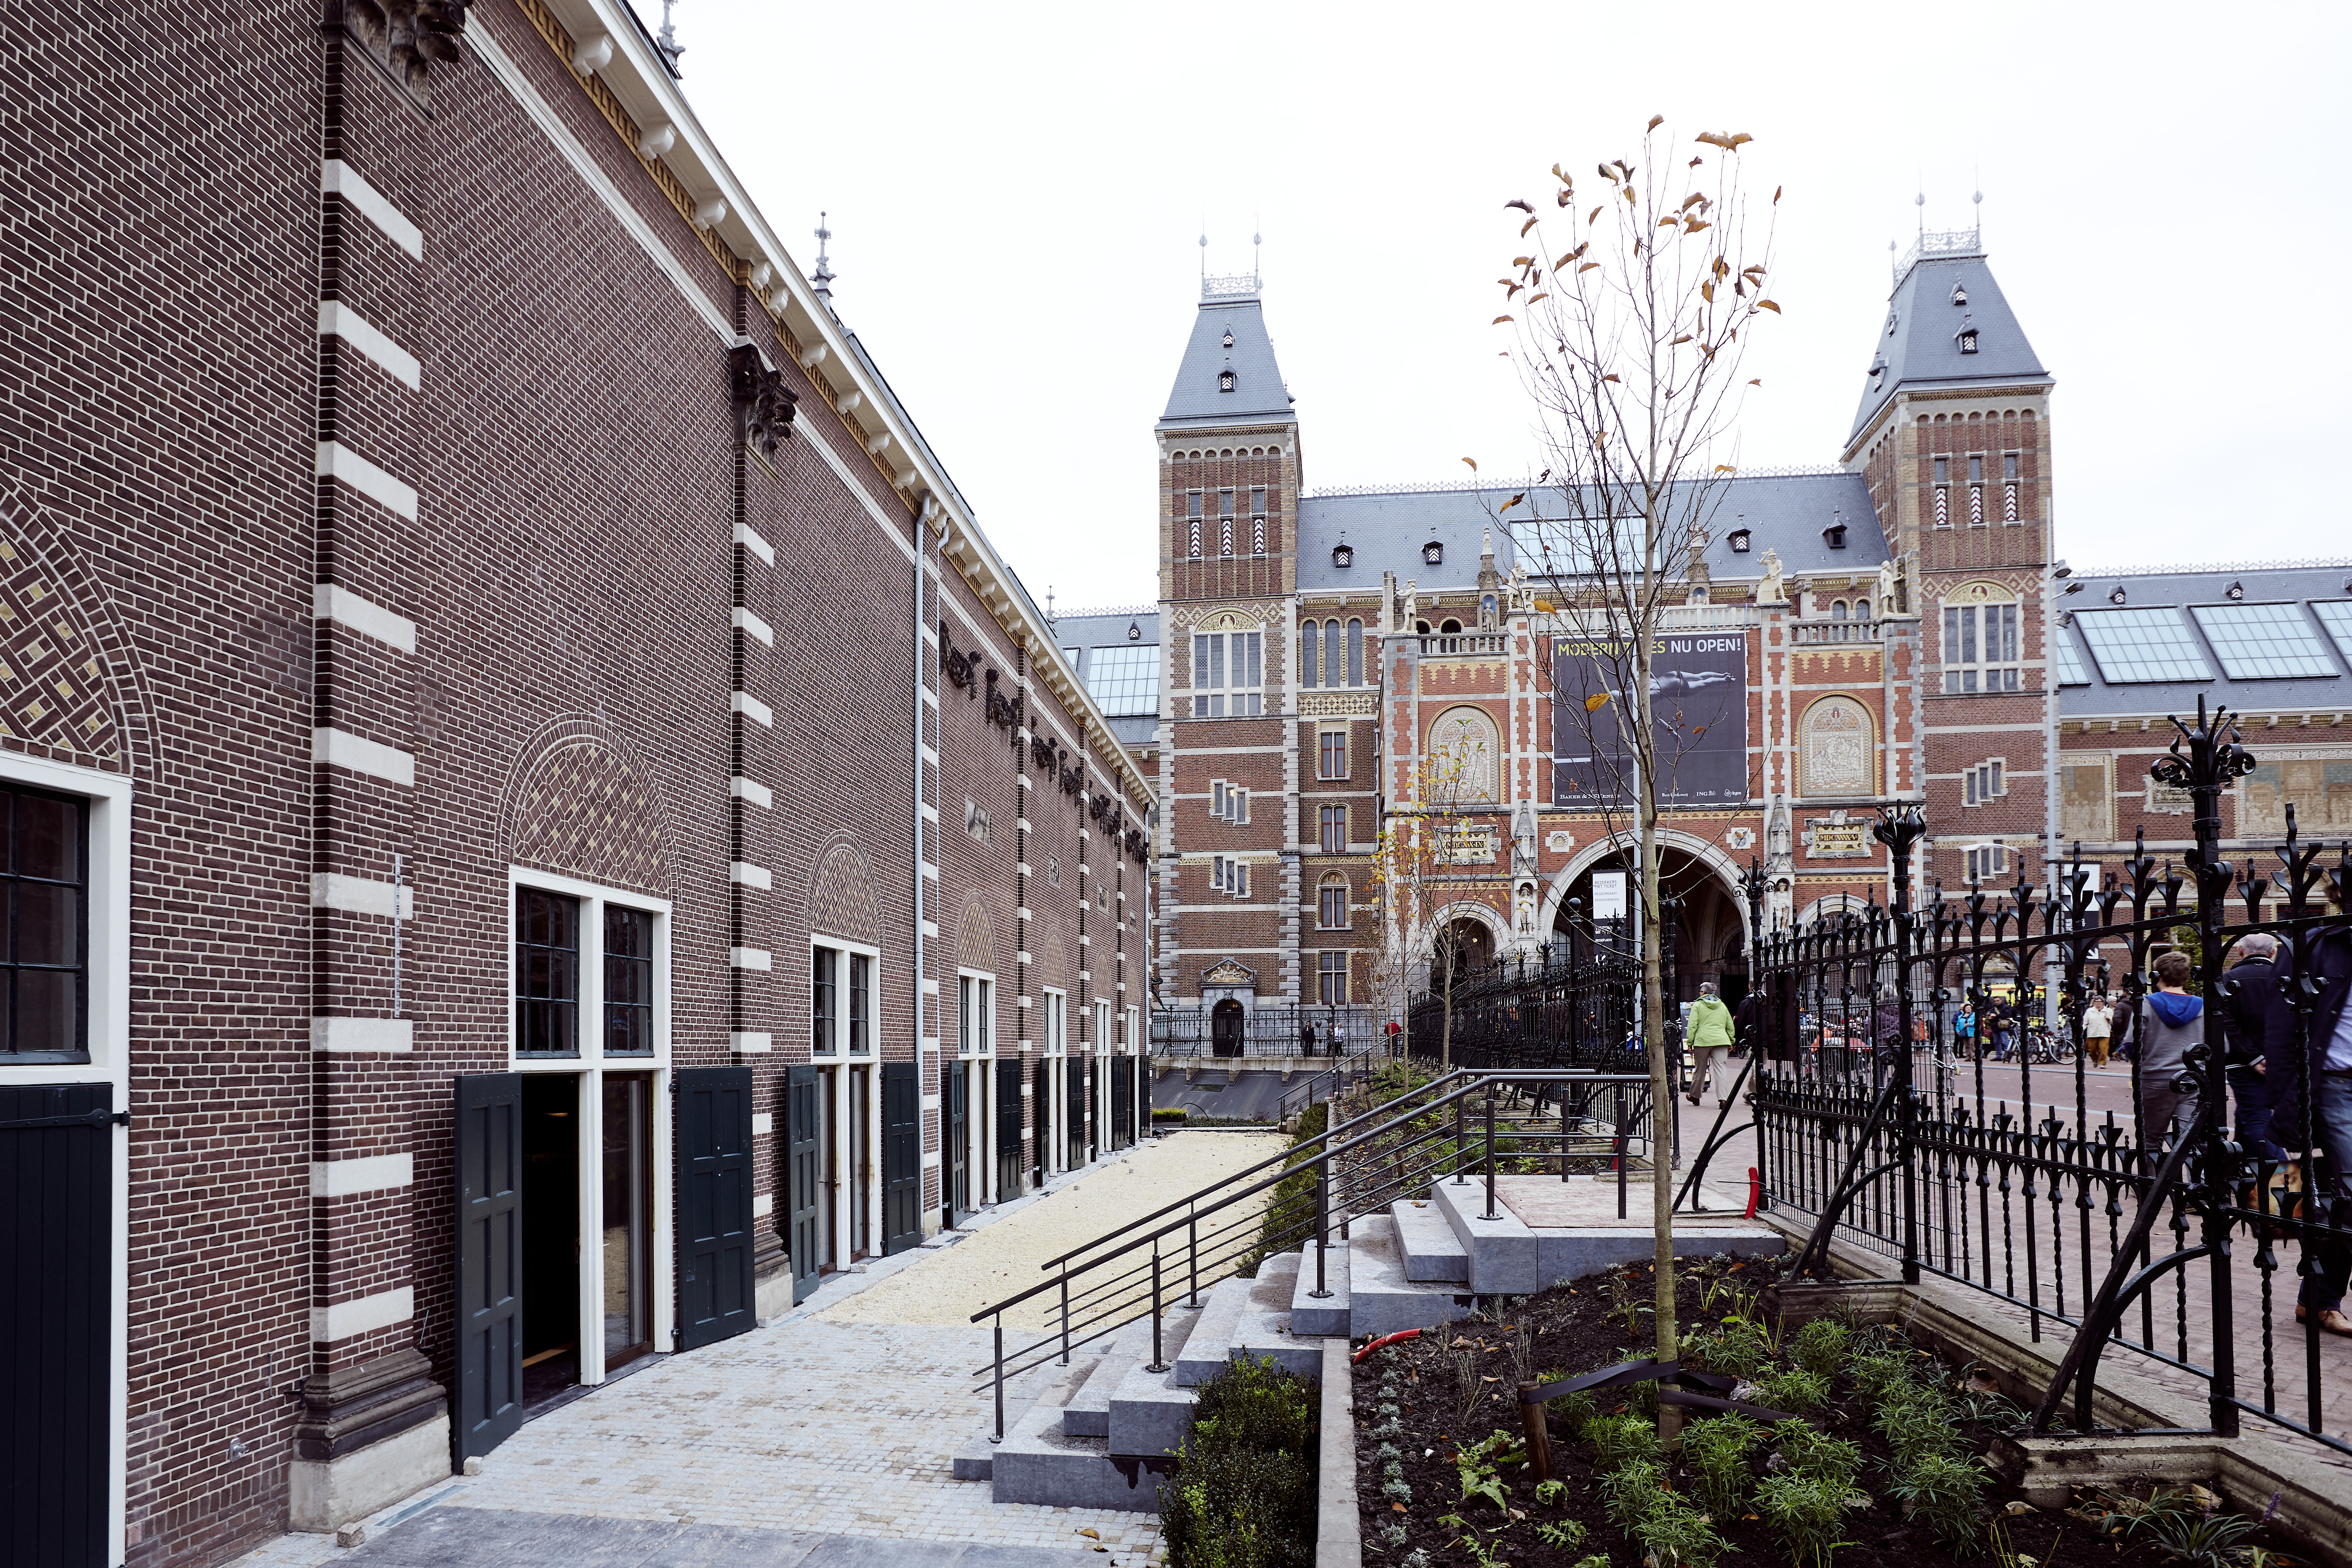 Restaurant RIJKS - Rijksmuseum - Daily Cappuccino - Lifestyle Blog